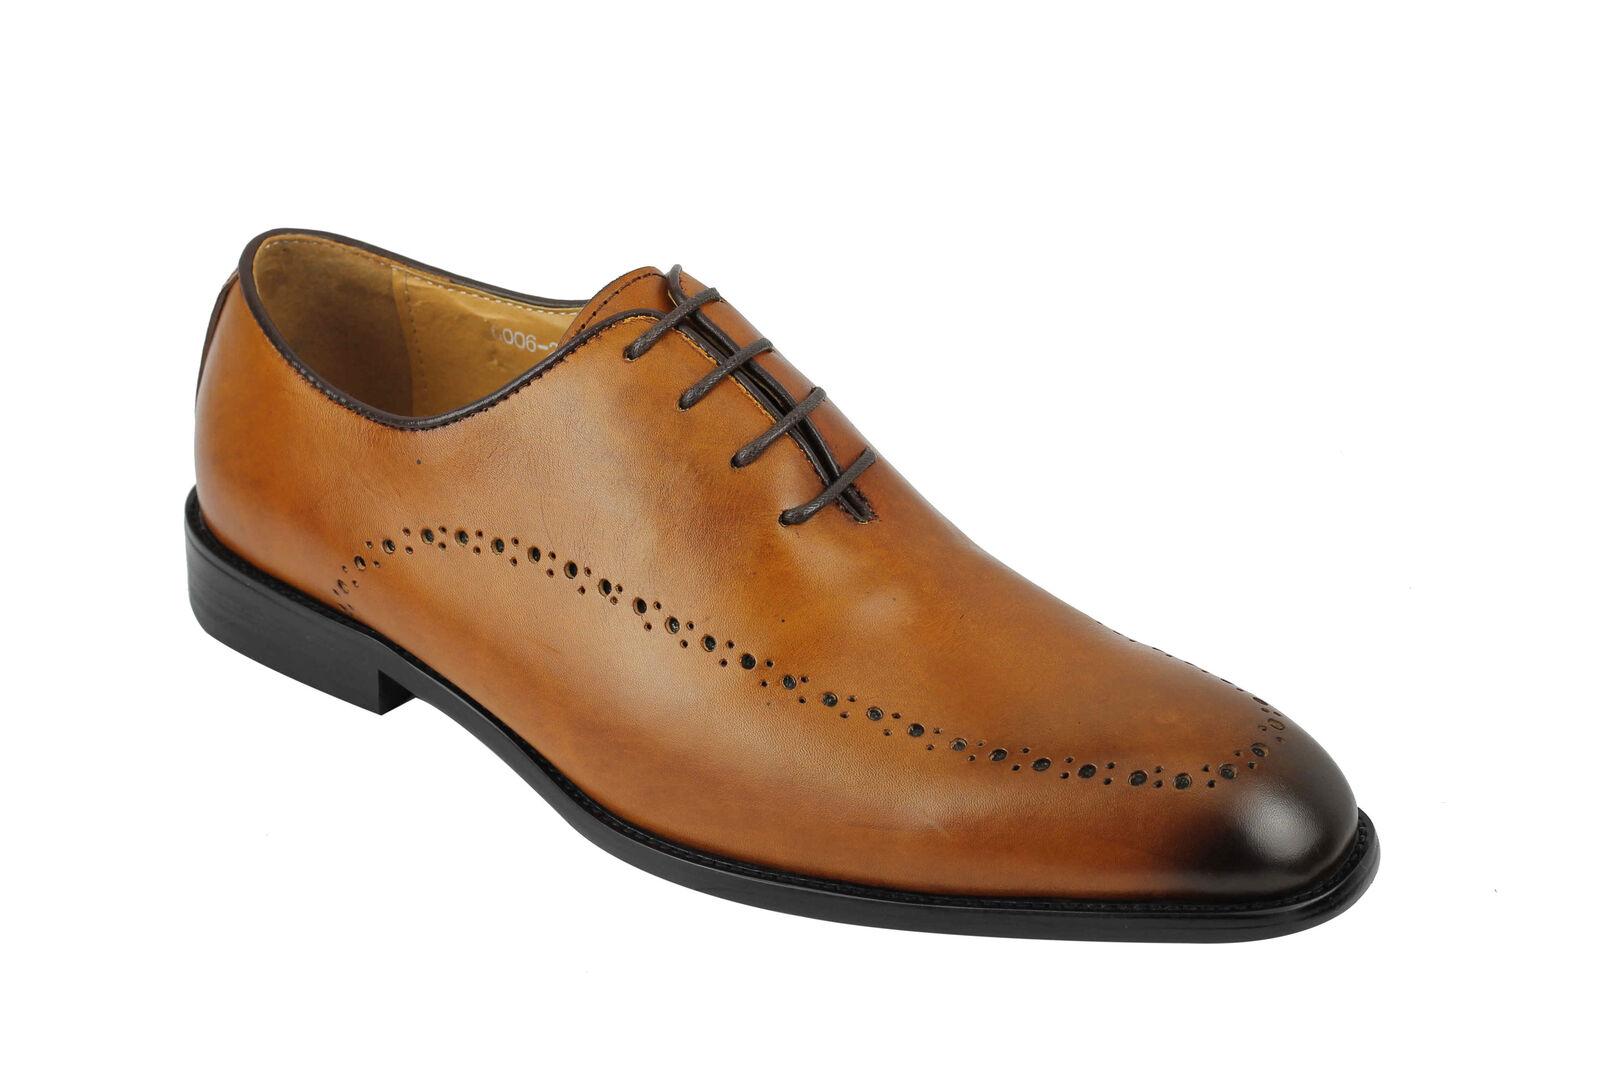 Mens Cut Vintage Real Leather Whole Cut Mens Oxford Lace up Shoes Tan Size 6 7 8 9 10 11 1c2d97